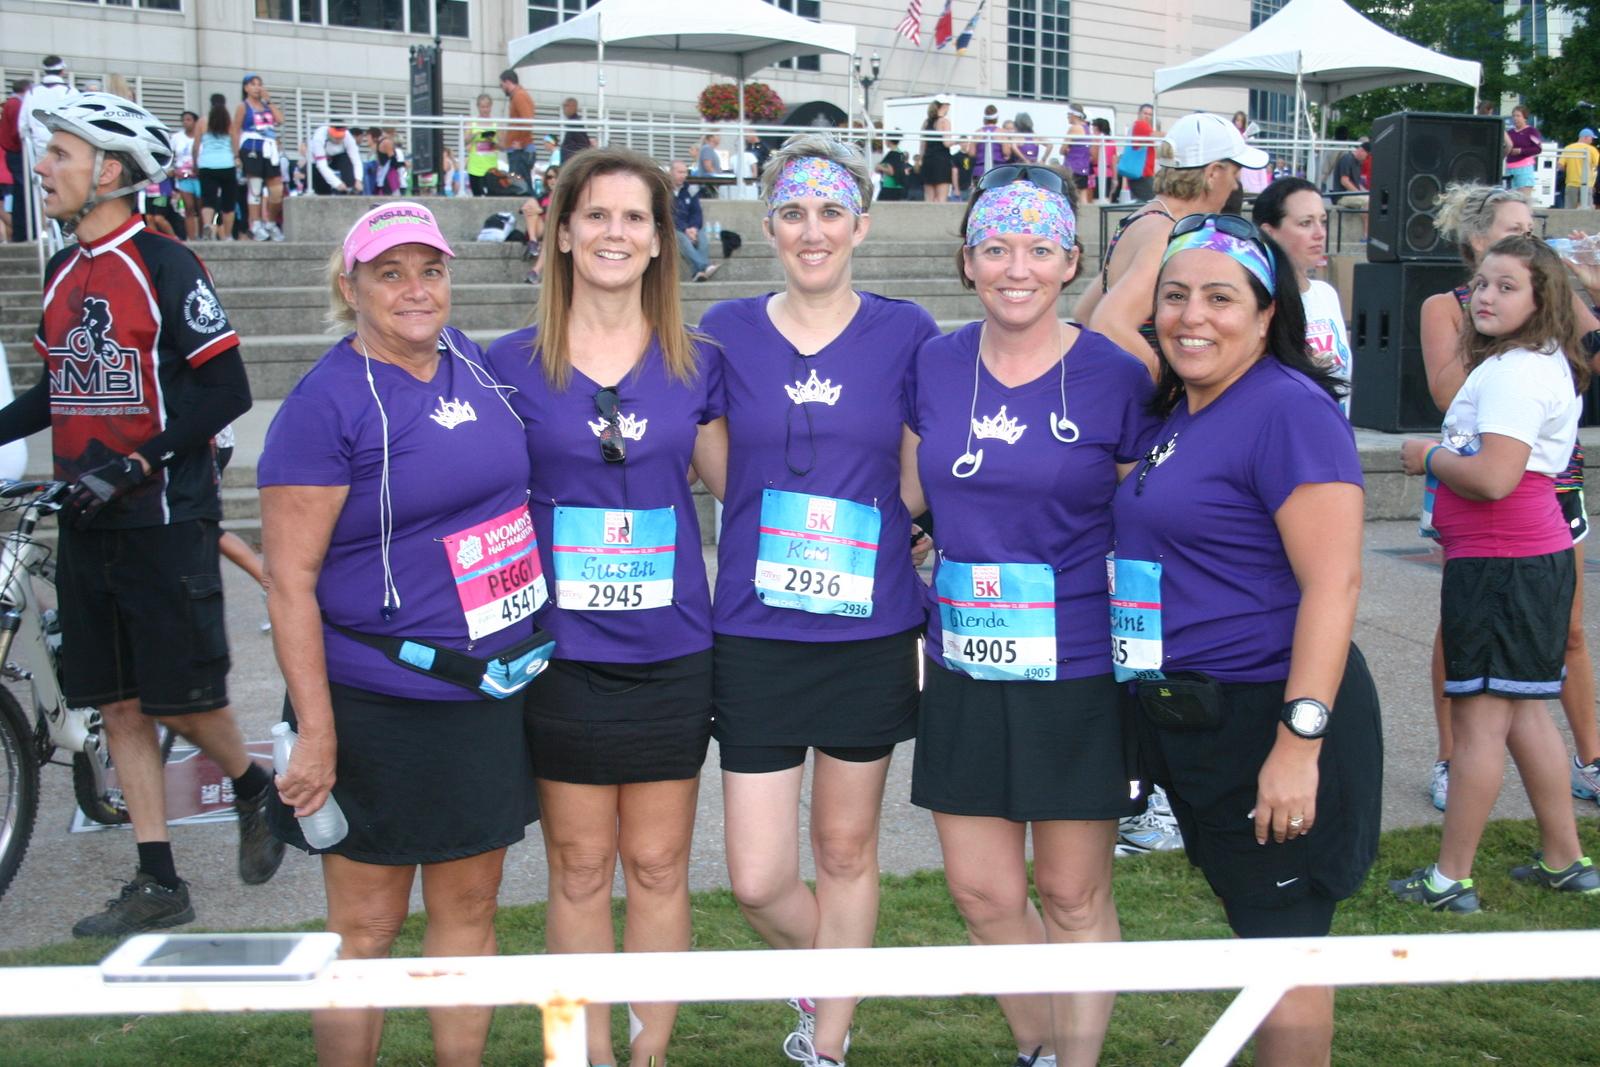 2012 Women's 5K with Susan Malone, Christine Sowell, Peggy Stanfield and Glenda Crowder